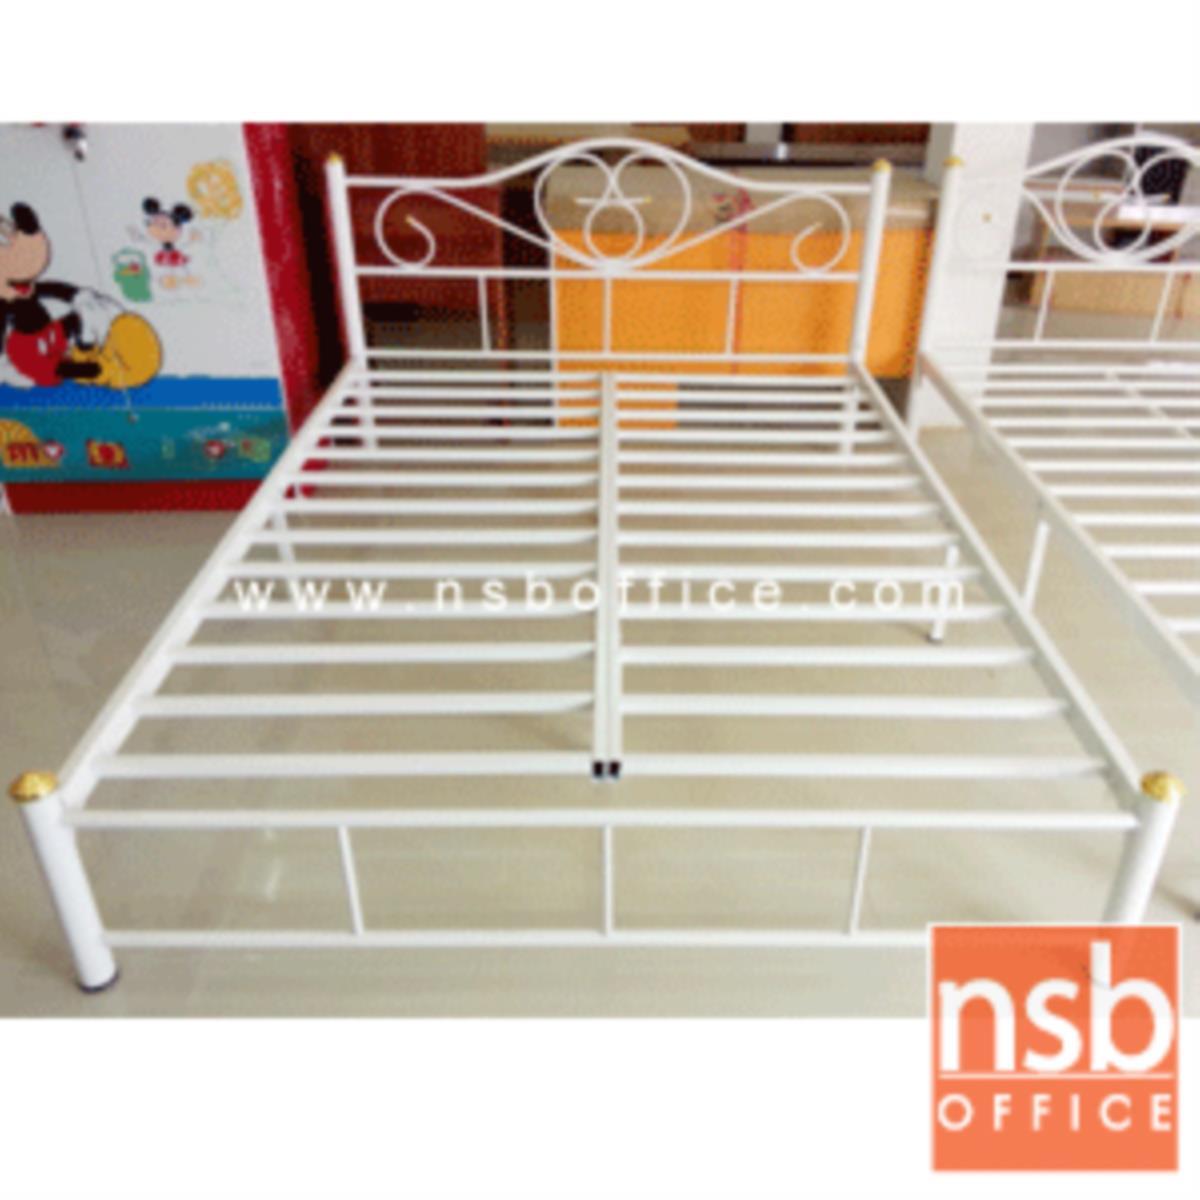 G11A015:เตียงเหล็ก 5 ฟุต รุ่นมาตรฐาน หนา 0.7 mm. ขนาด 152.4W* 200D* 33H cm. (ลายบัว)